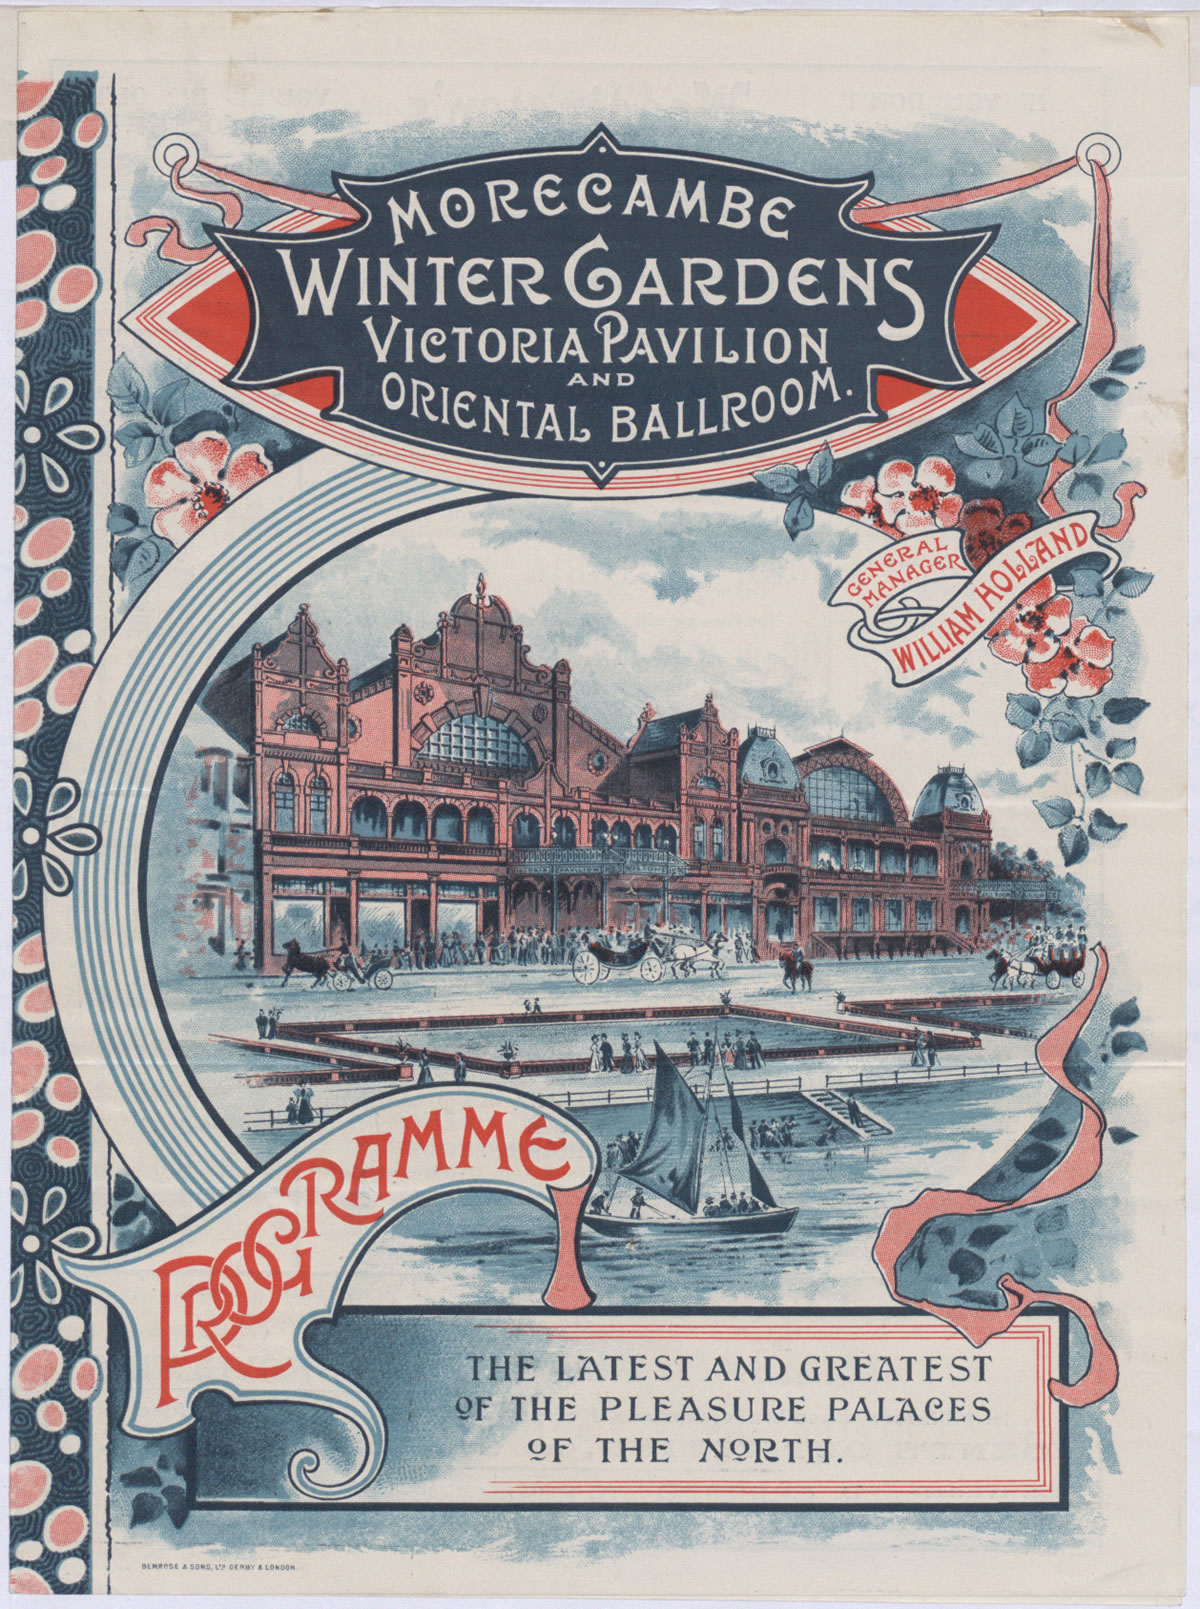 Morecambe Winter Gardens Pleasure Palace, 1897 (COPY 1/134 f.135)